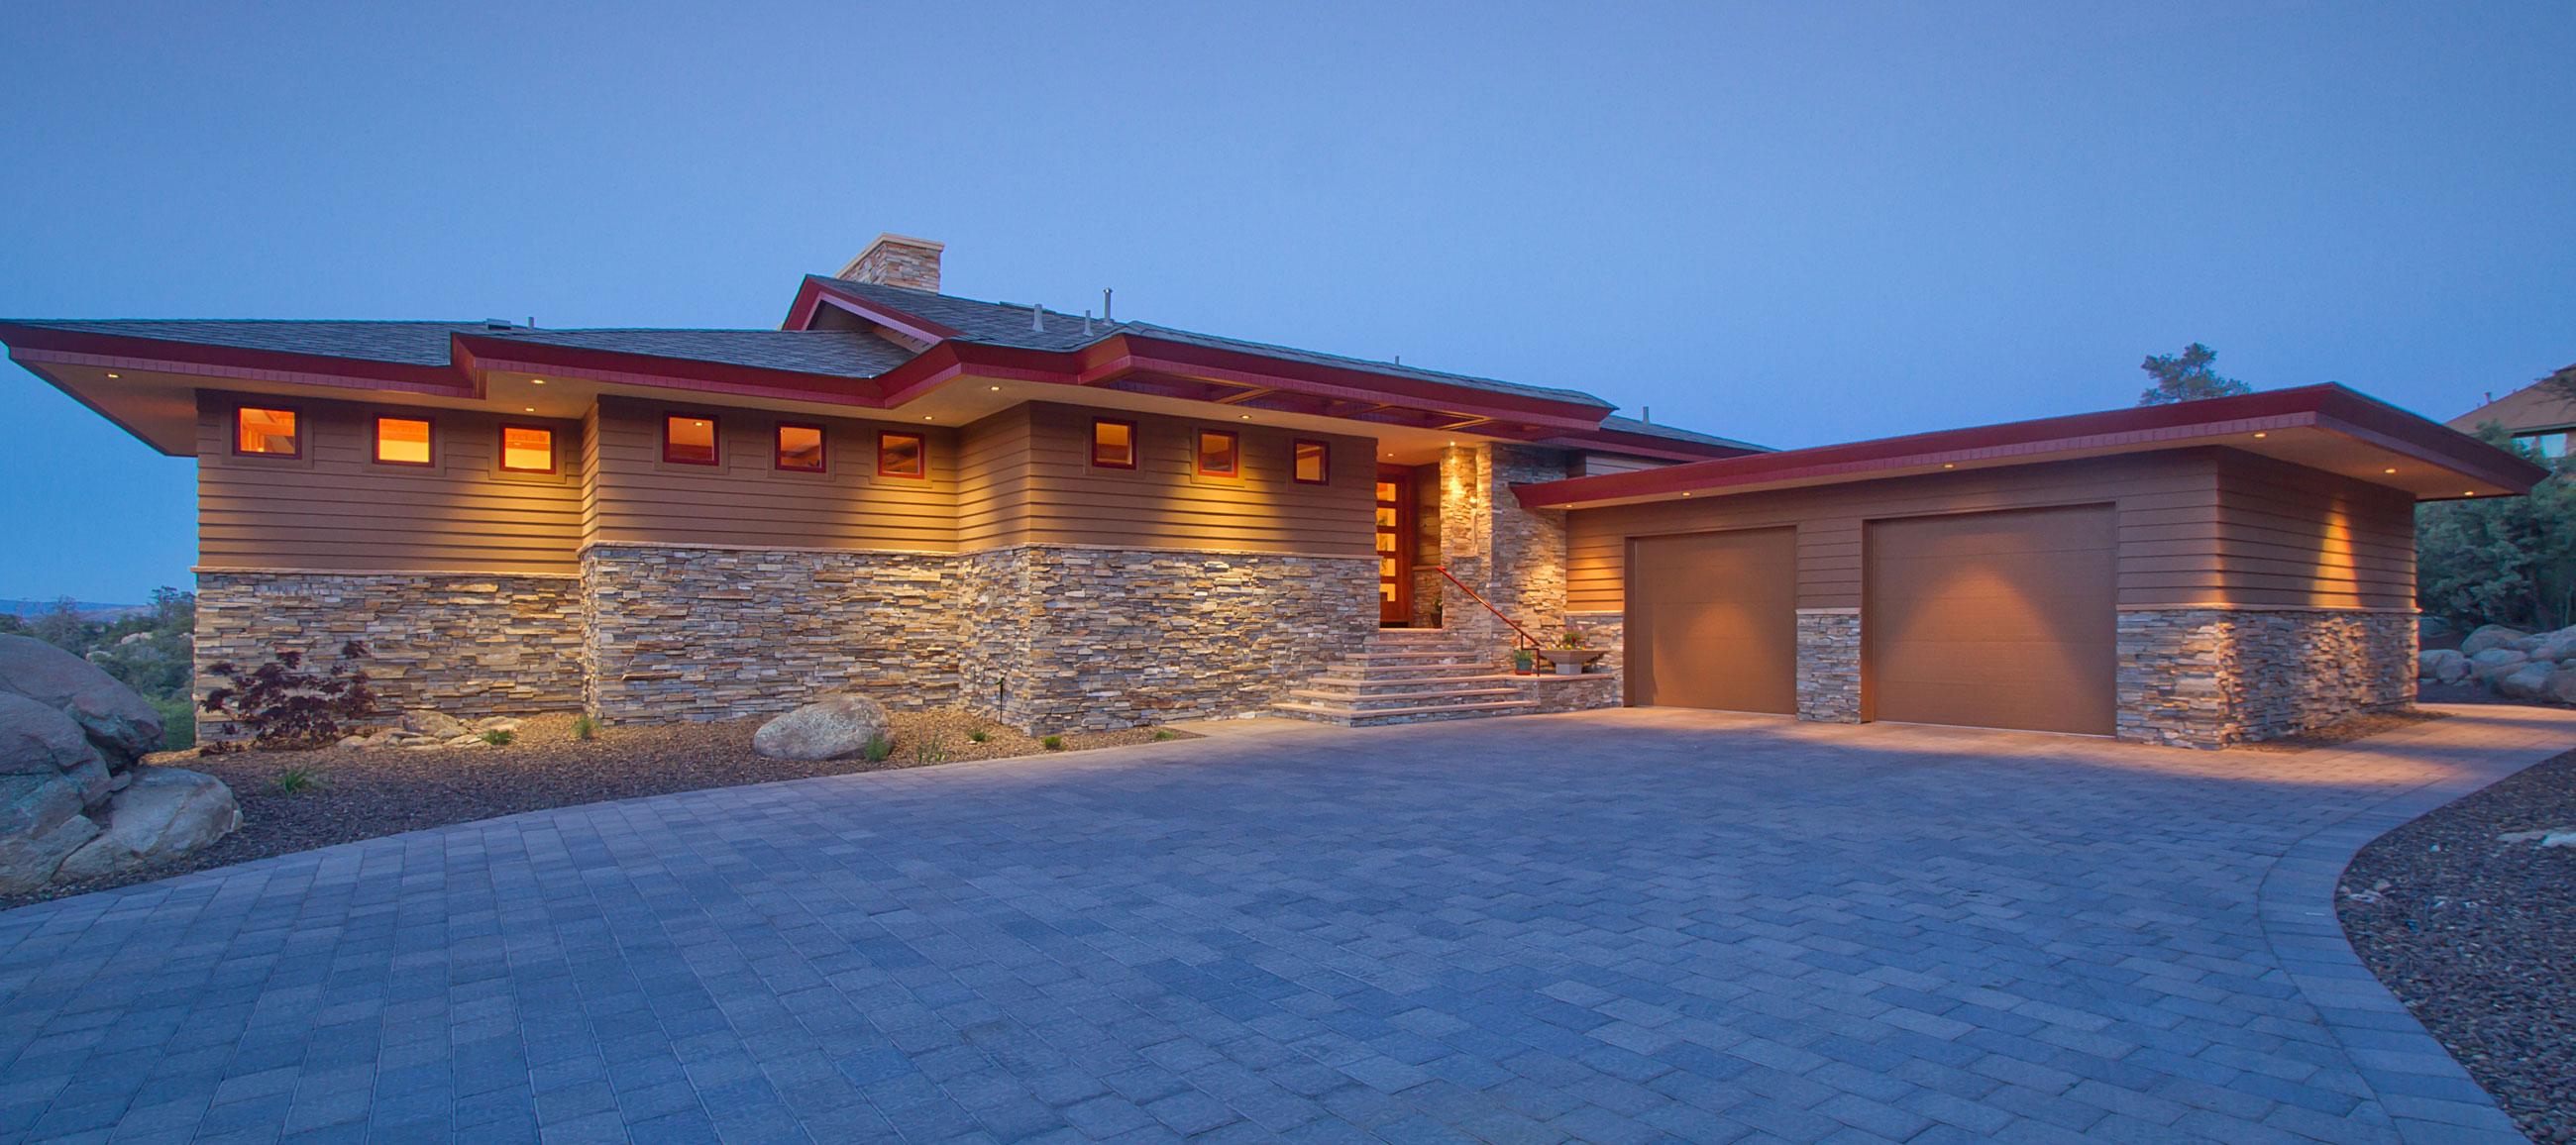 Hinshaw Residence in Prescott by Michael Rust-10